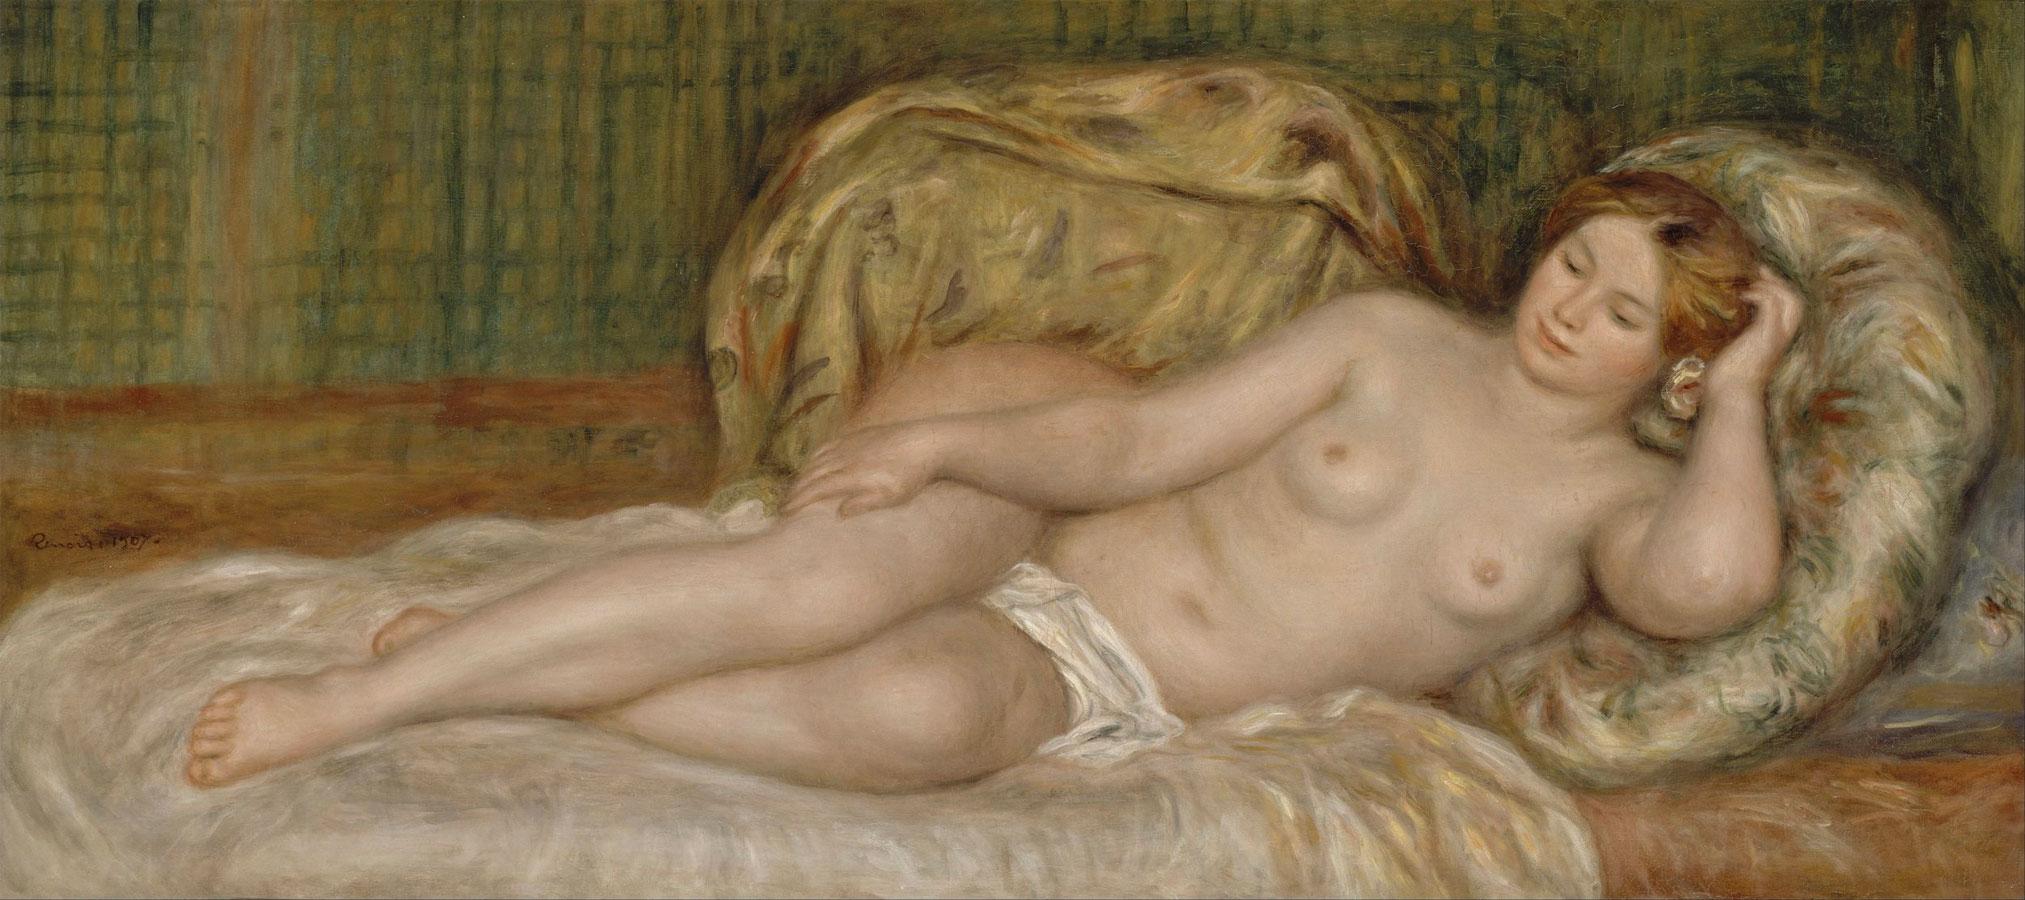 Grande nudo (Renoir, 1907)